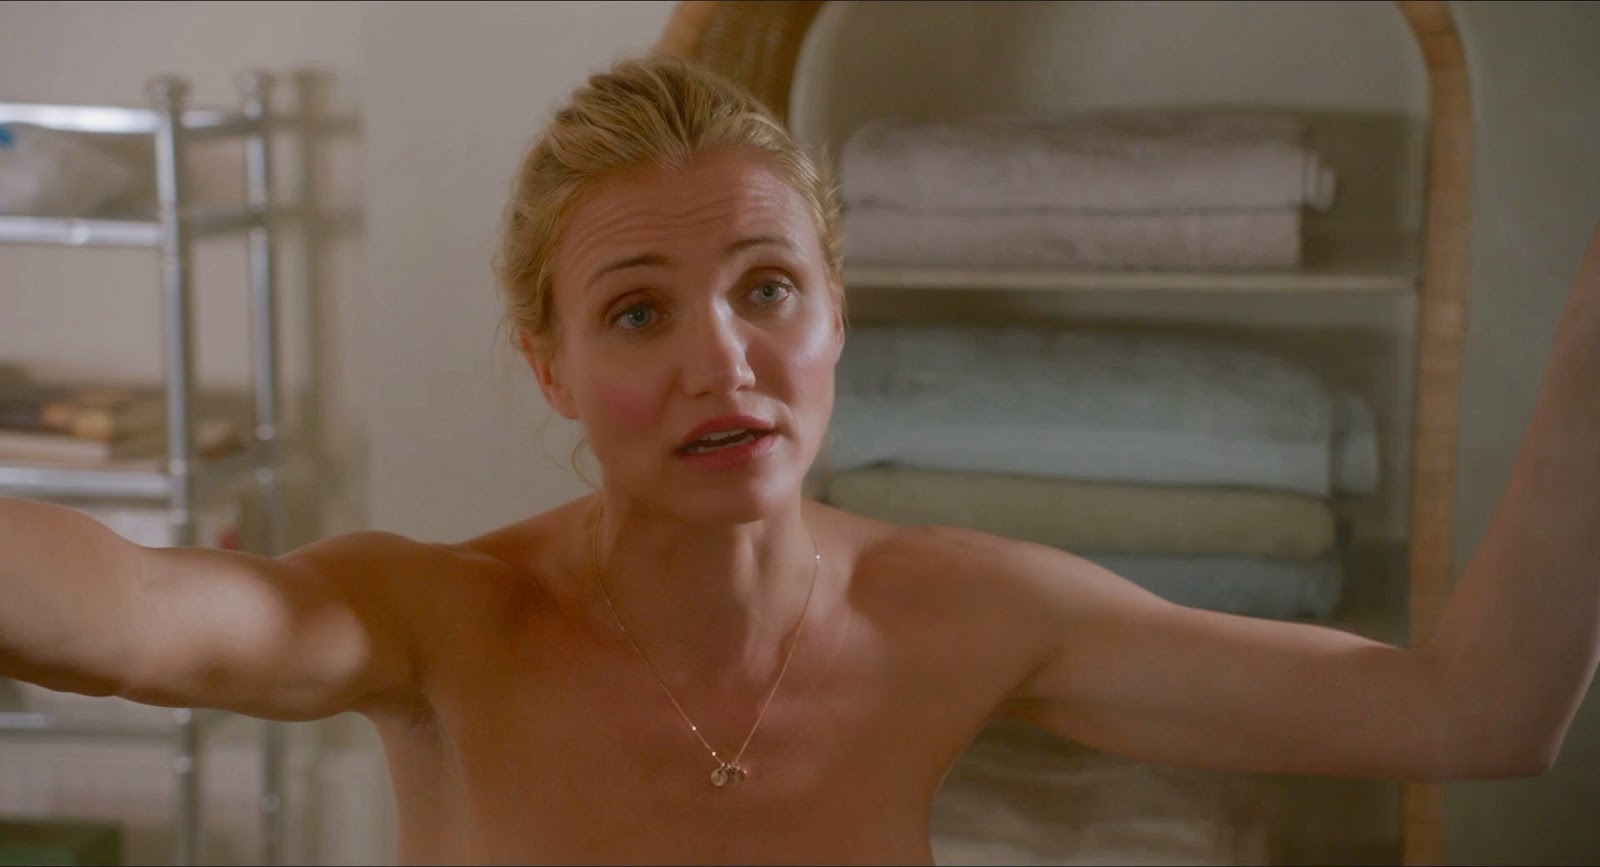 le sexe vidio sex tape imdb